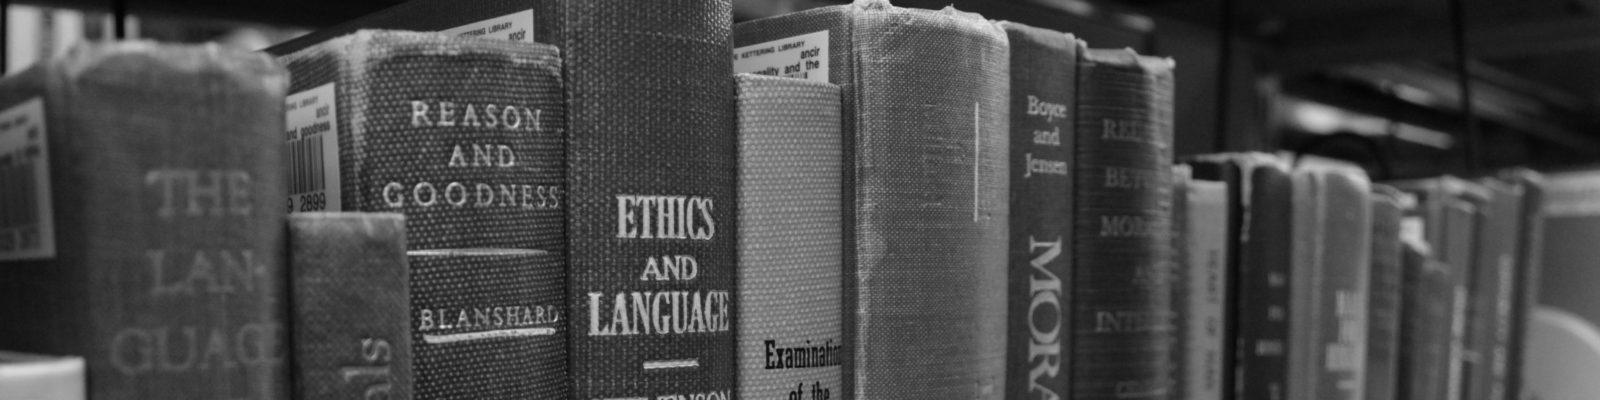 Ethics and Language